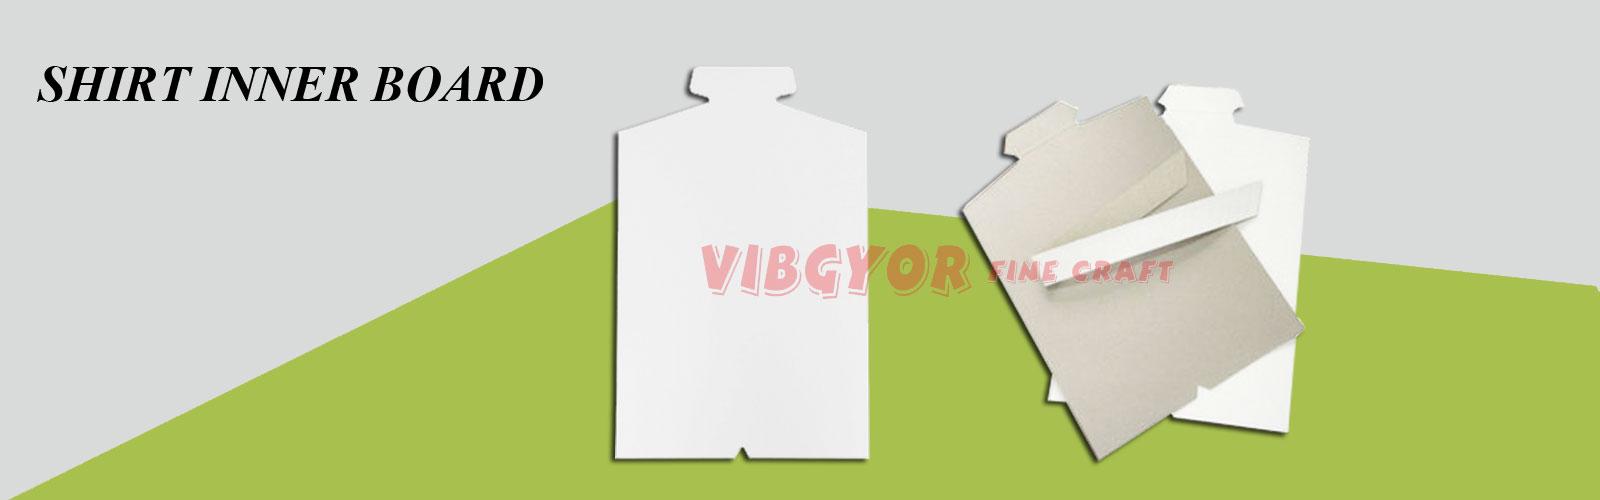 Shirt Inner Board